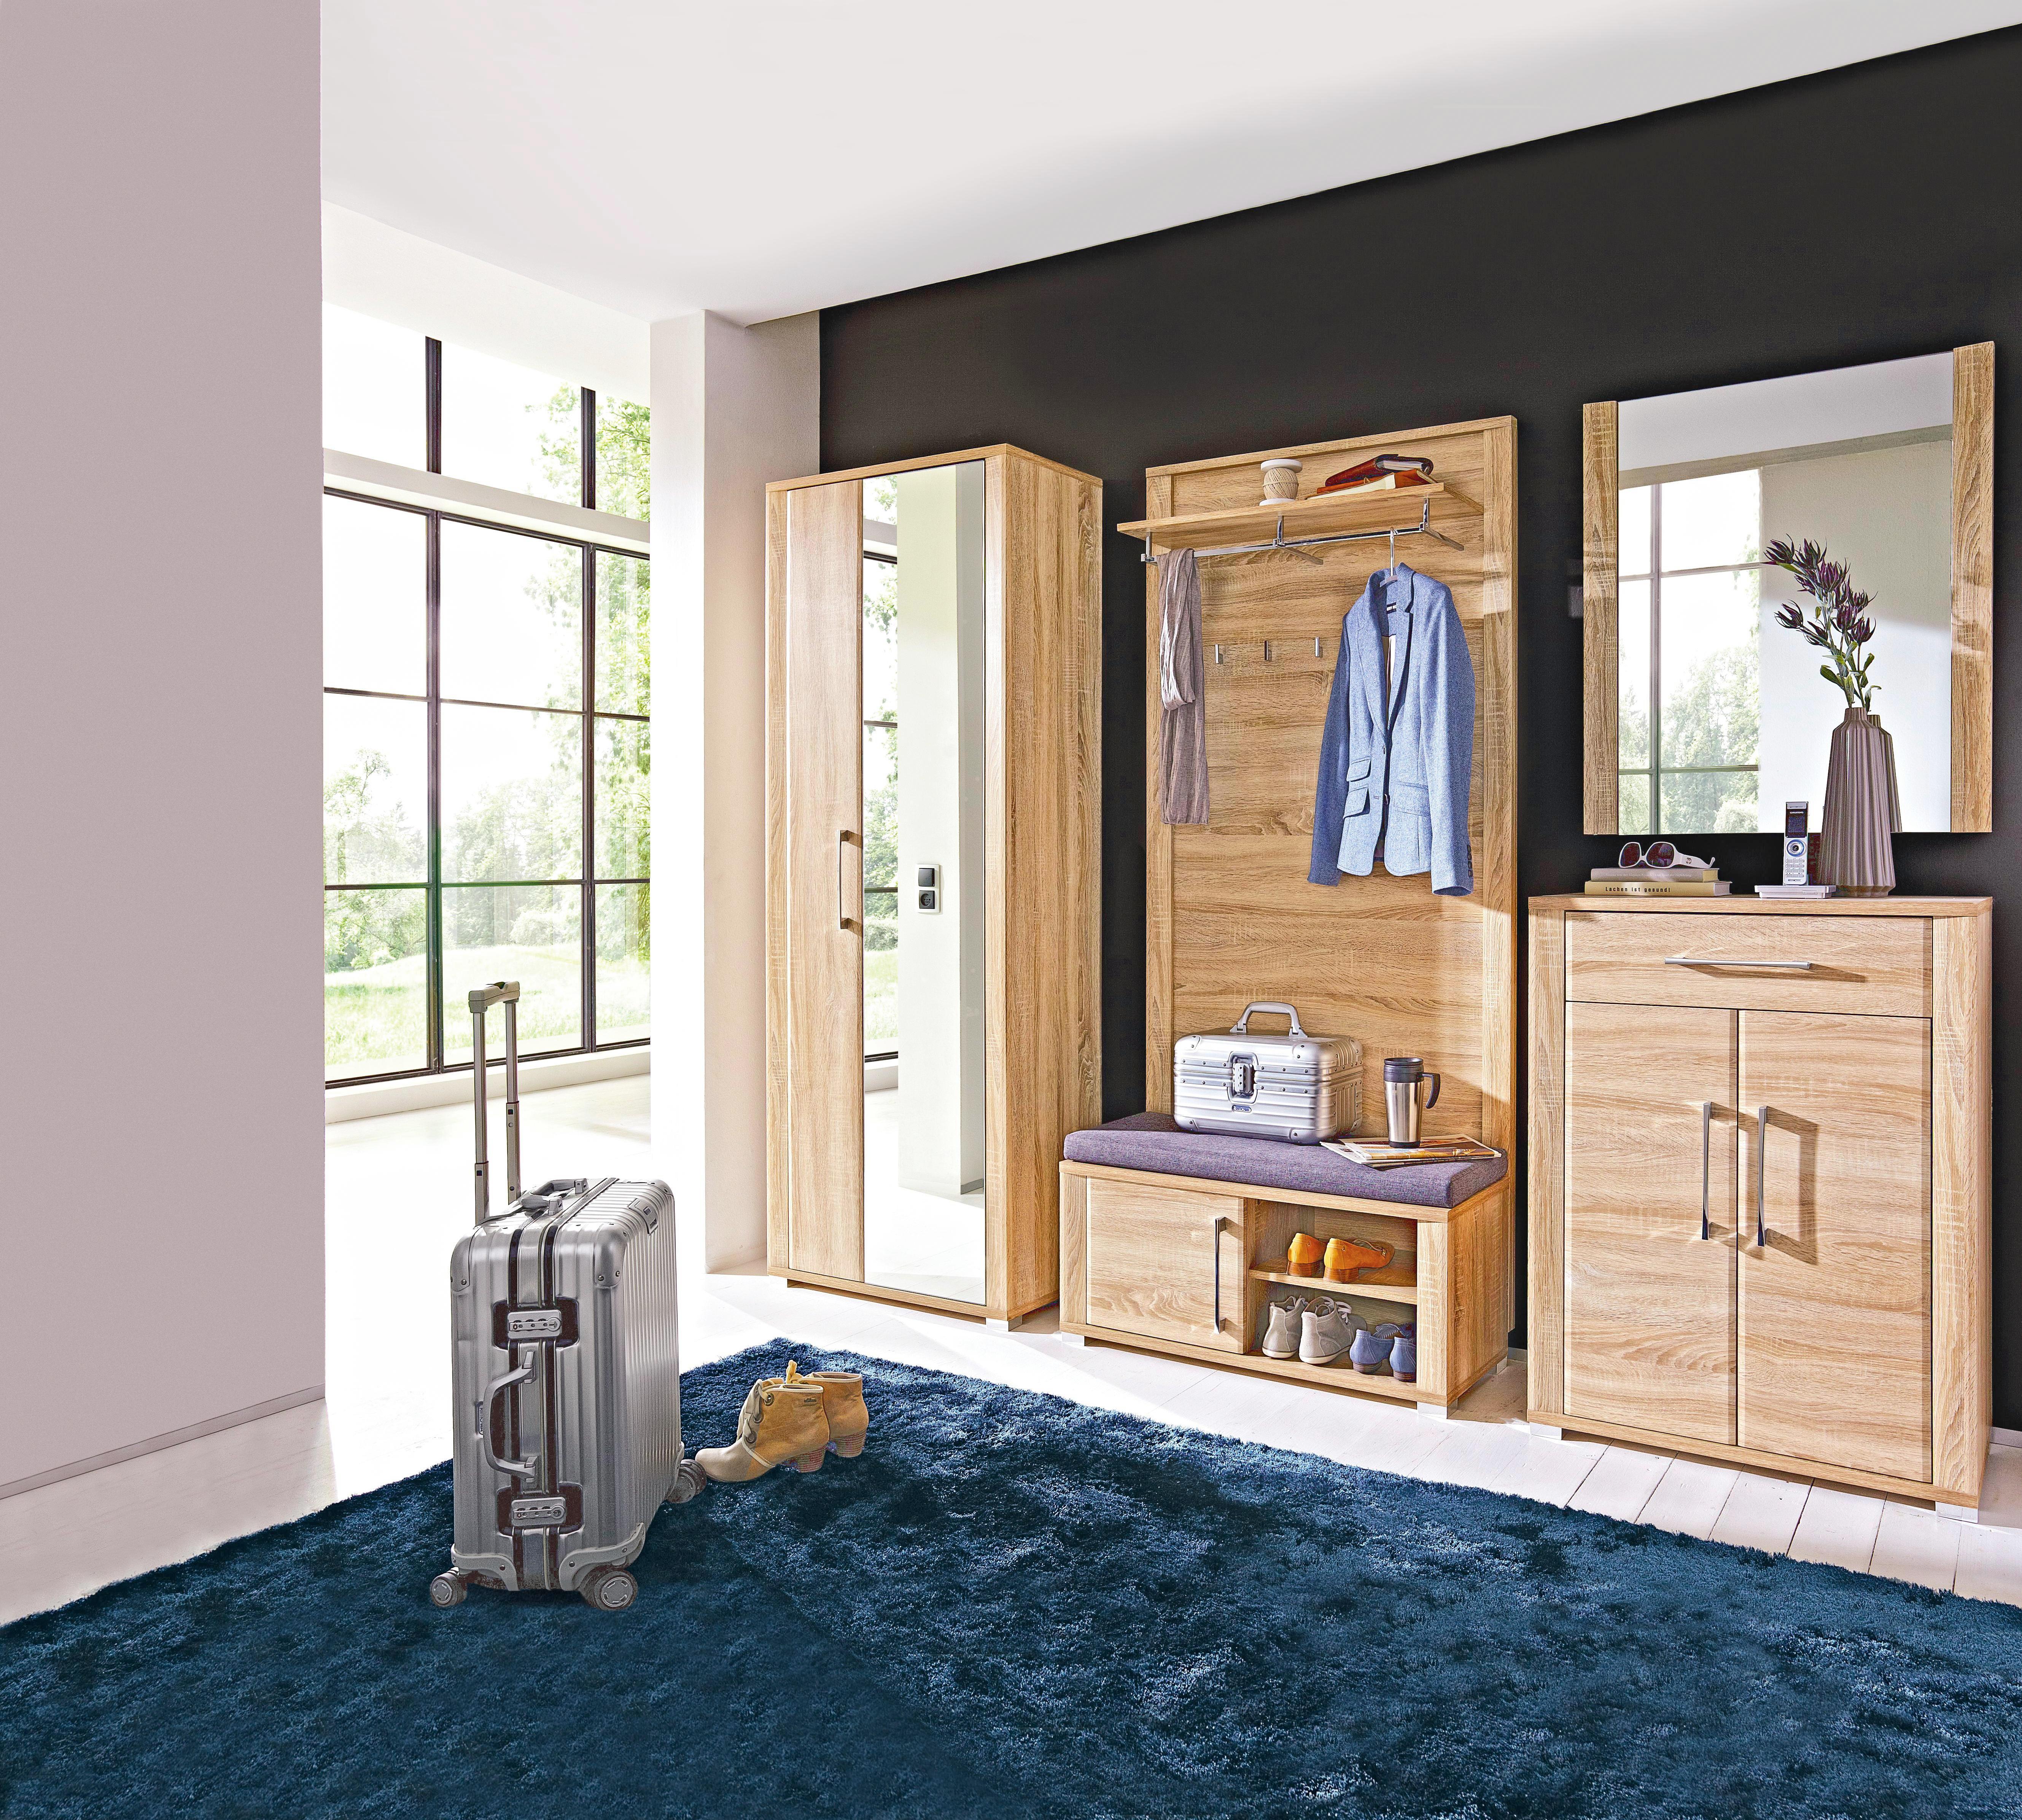 SCHUHSCHRANK Sonoma Eiche - Chromfarben/Sonoma Eiche, Basics, Holzwerkstoff/Kunststoff (74/100/40cm) - CANTUS